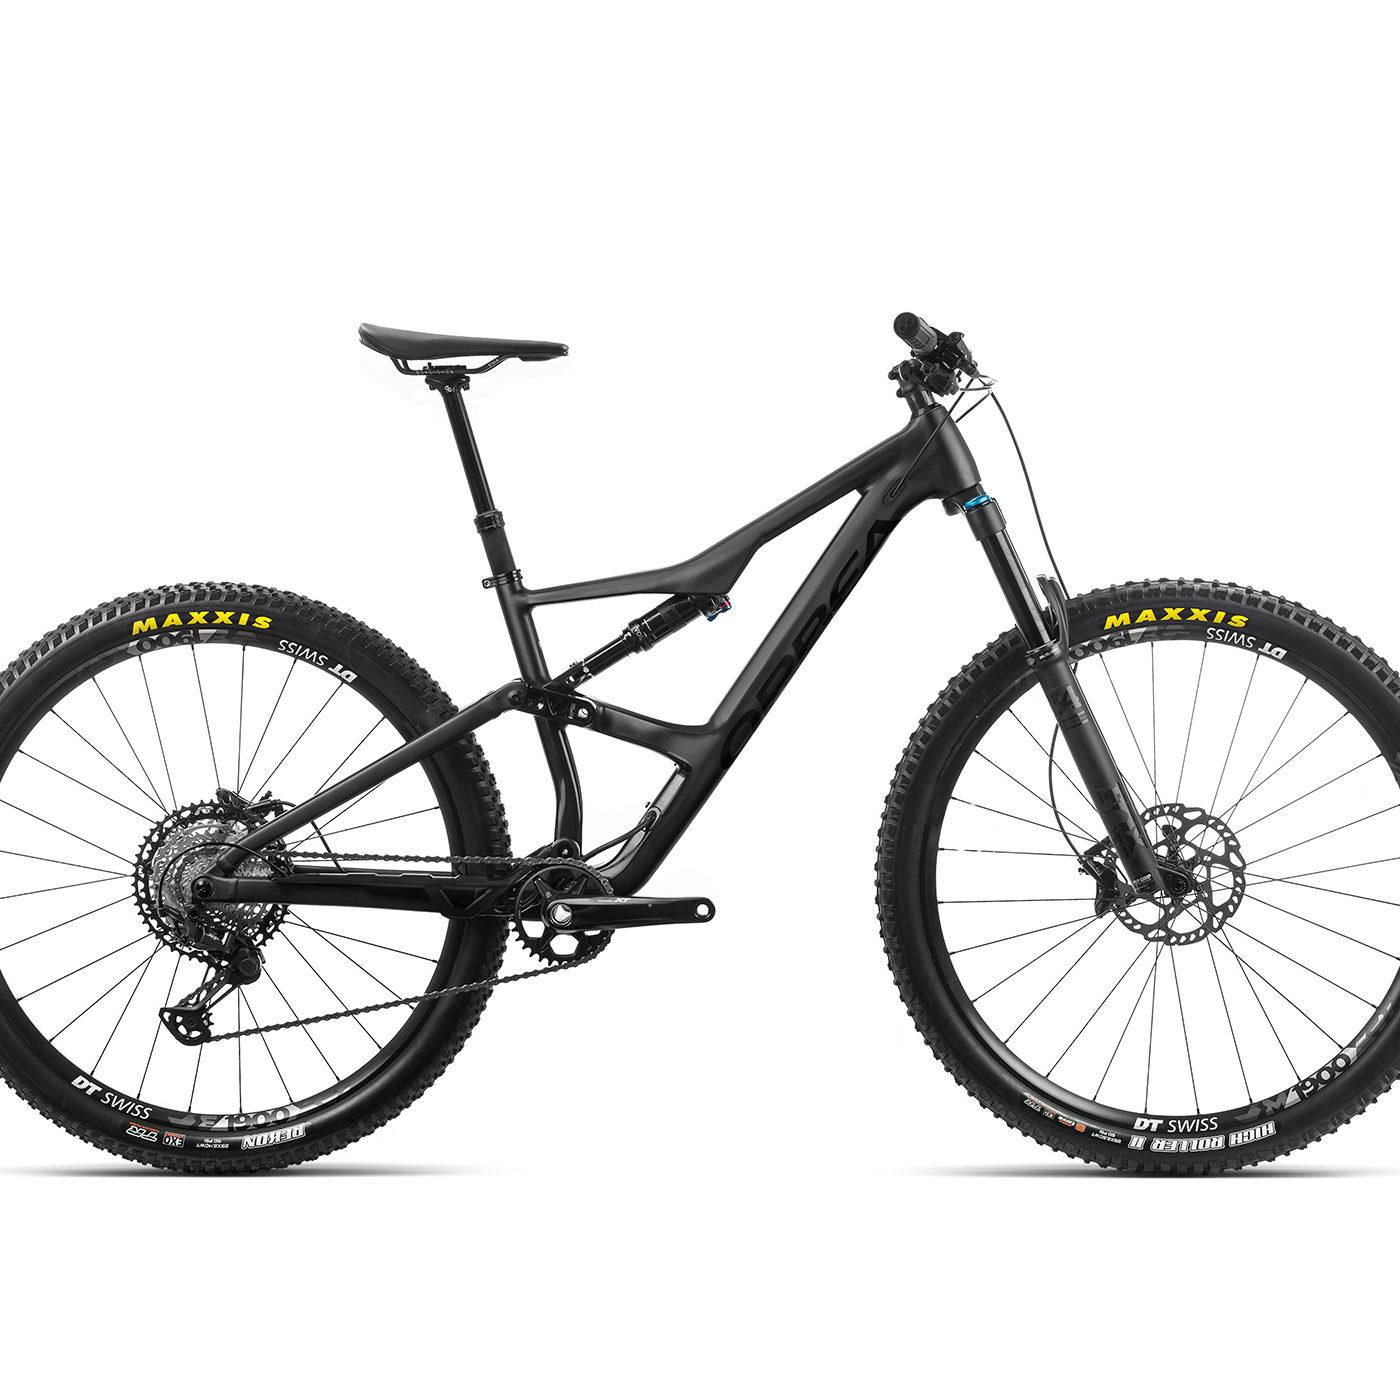 ORBEA Occam H10 - METALLIC ZWART (DOF-GLOSS) @G-Bikes